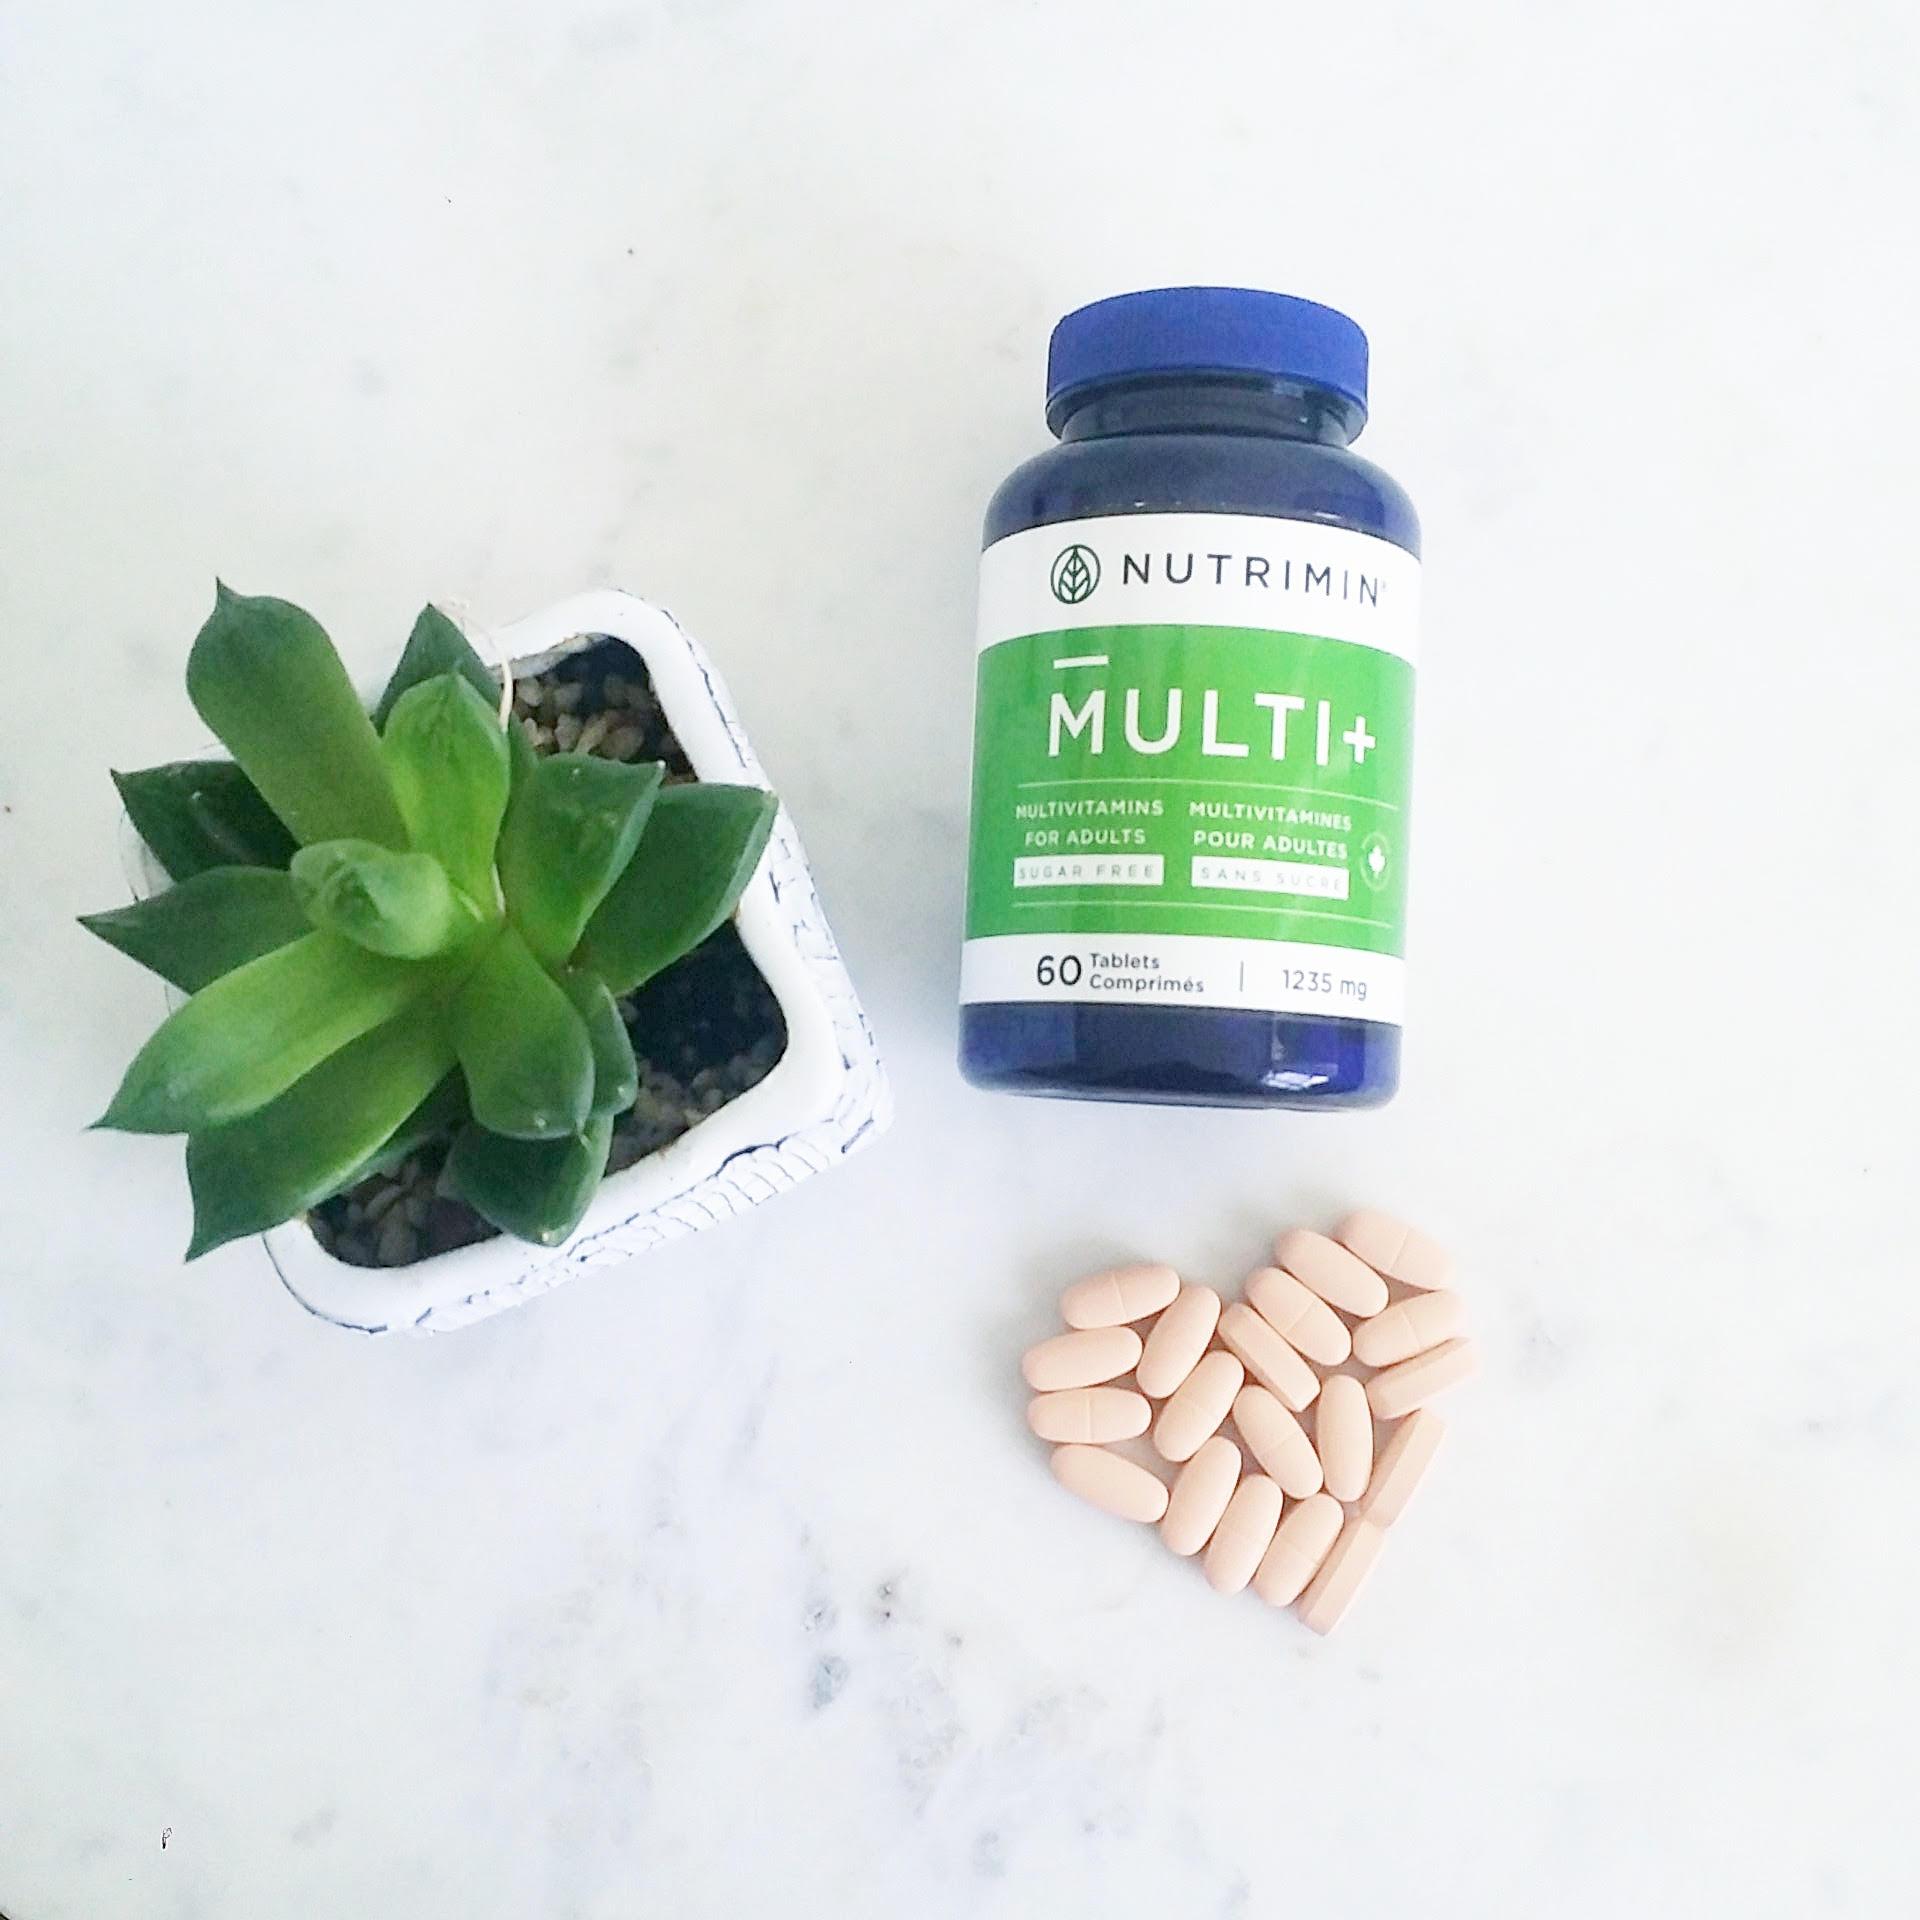 Nutrimin Halal Vitamins & Zuhoor Designs Succulant available at The Date Palm.  PC: Sundus Ali